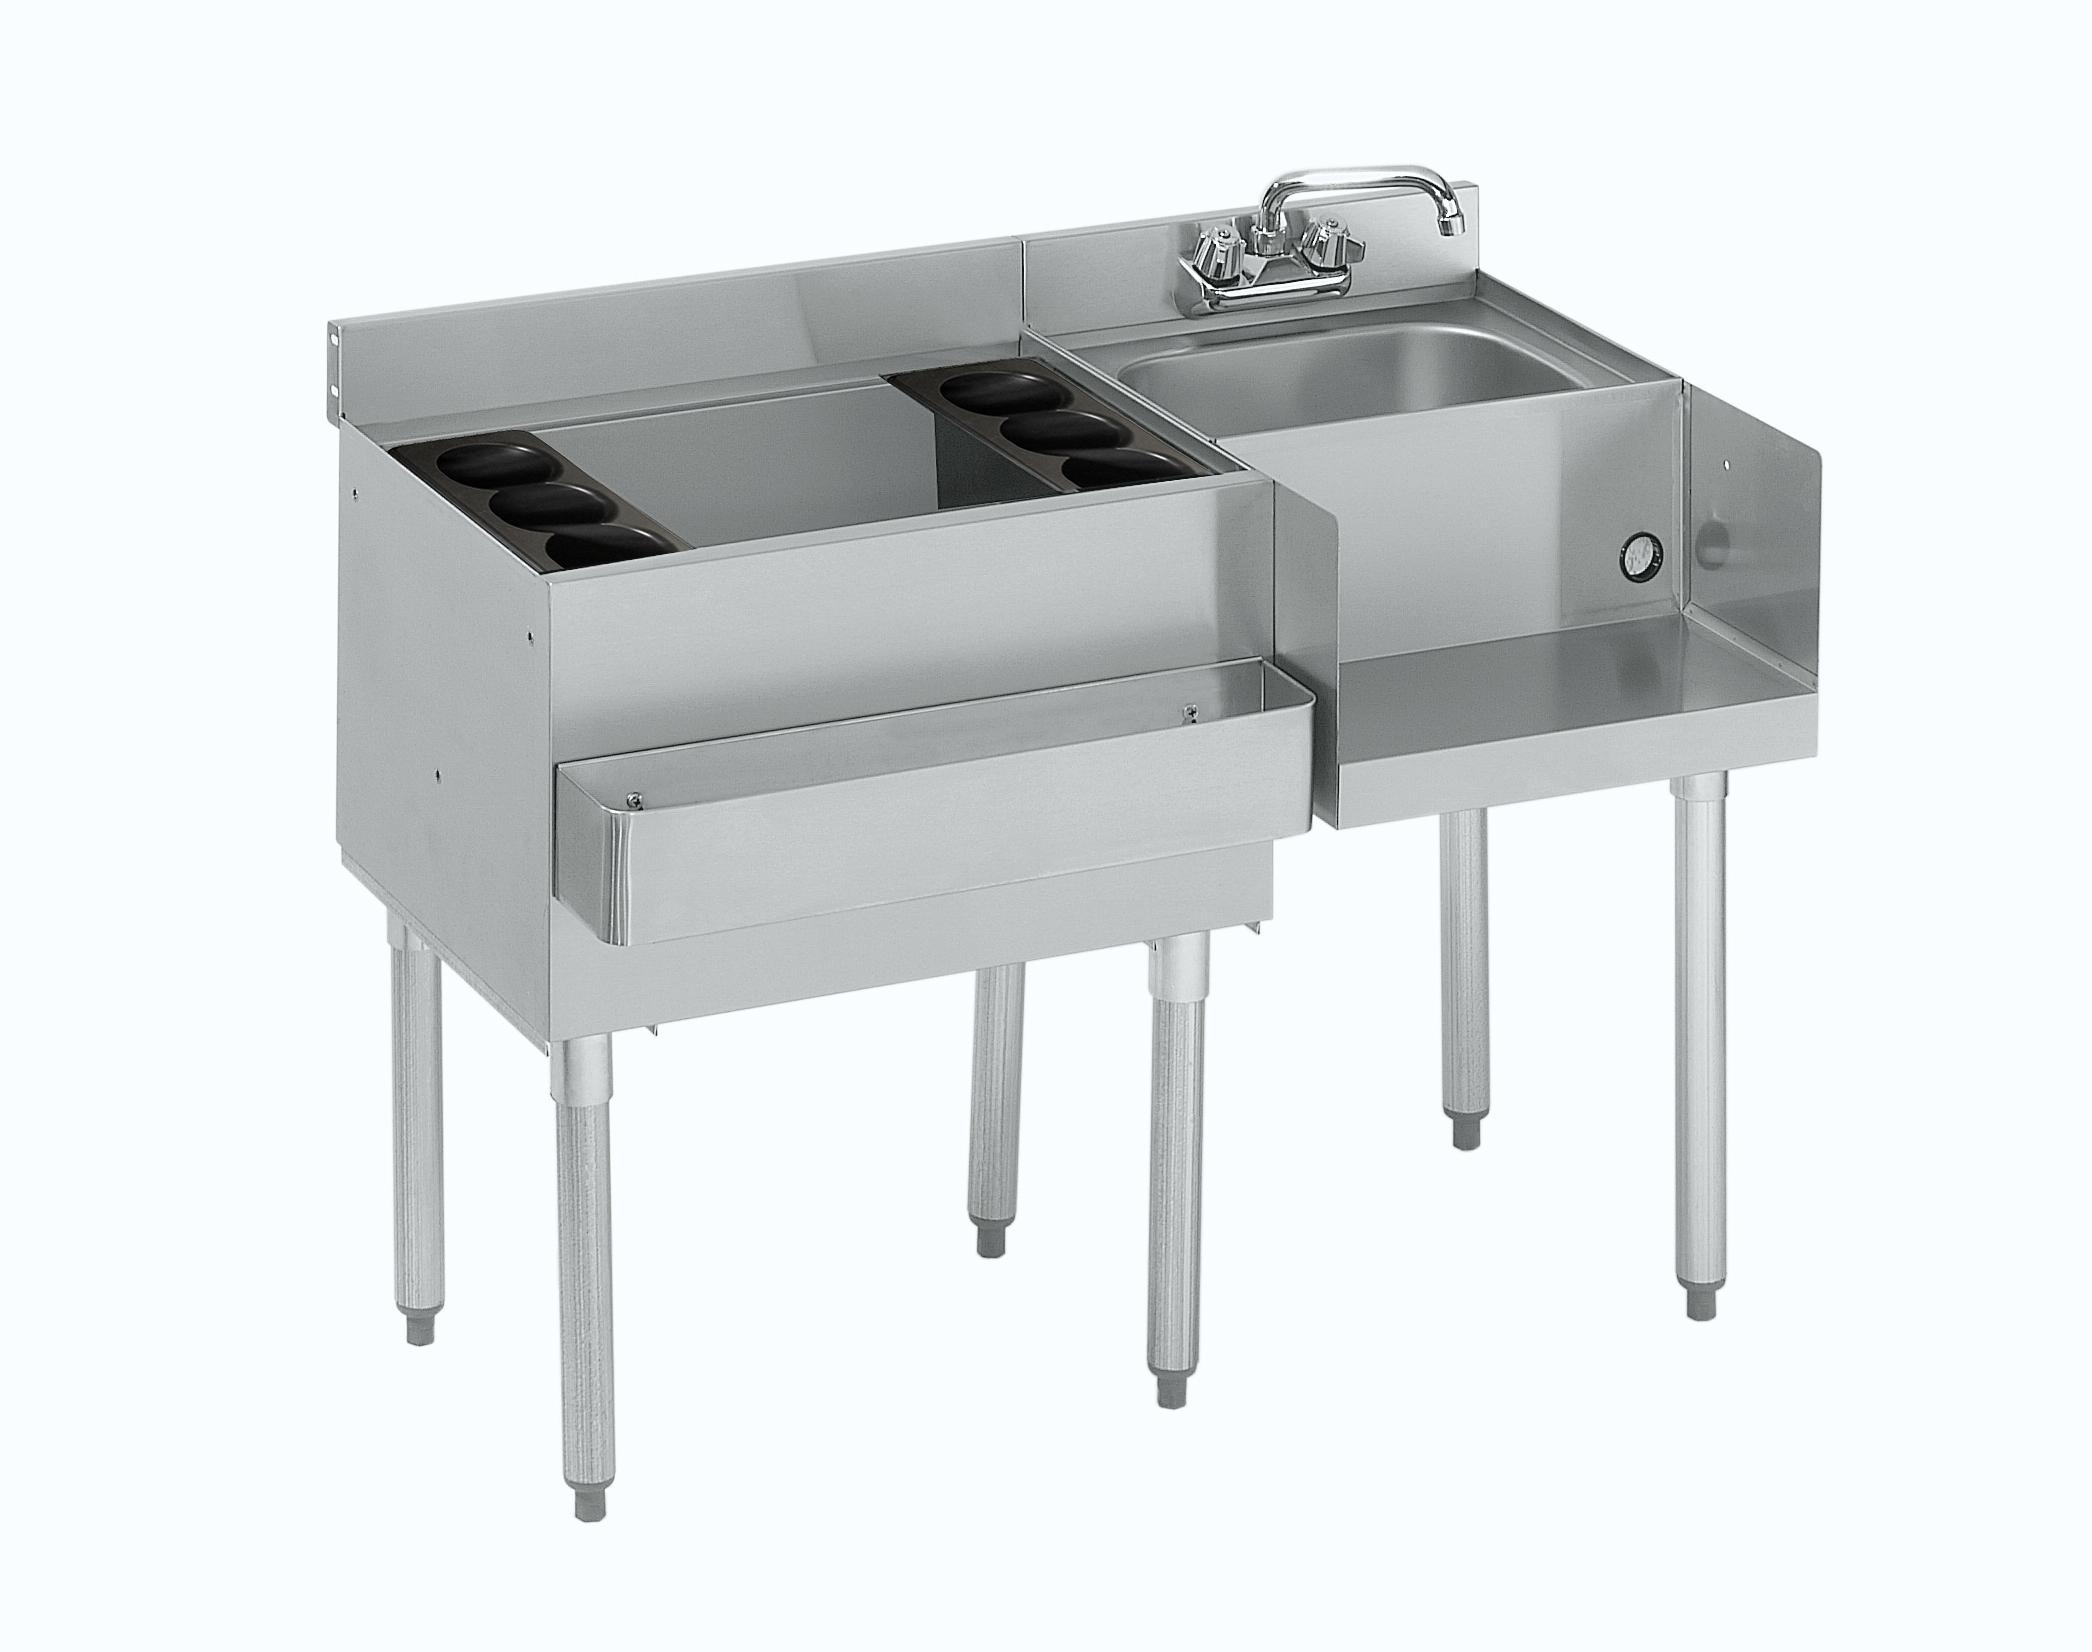 Krowne Metal 18-W48L-7 underbar ice bin/cocktail station, blender station